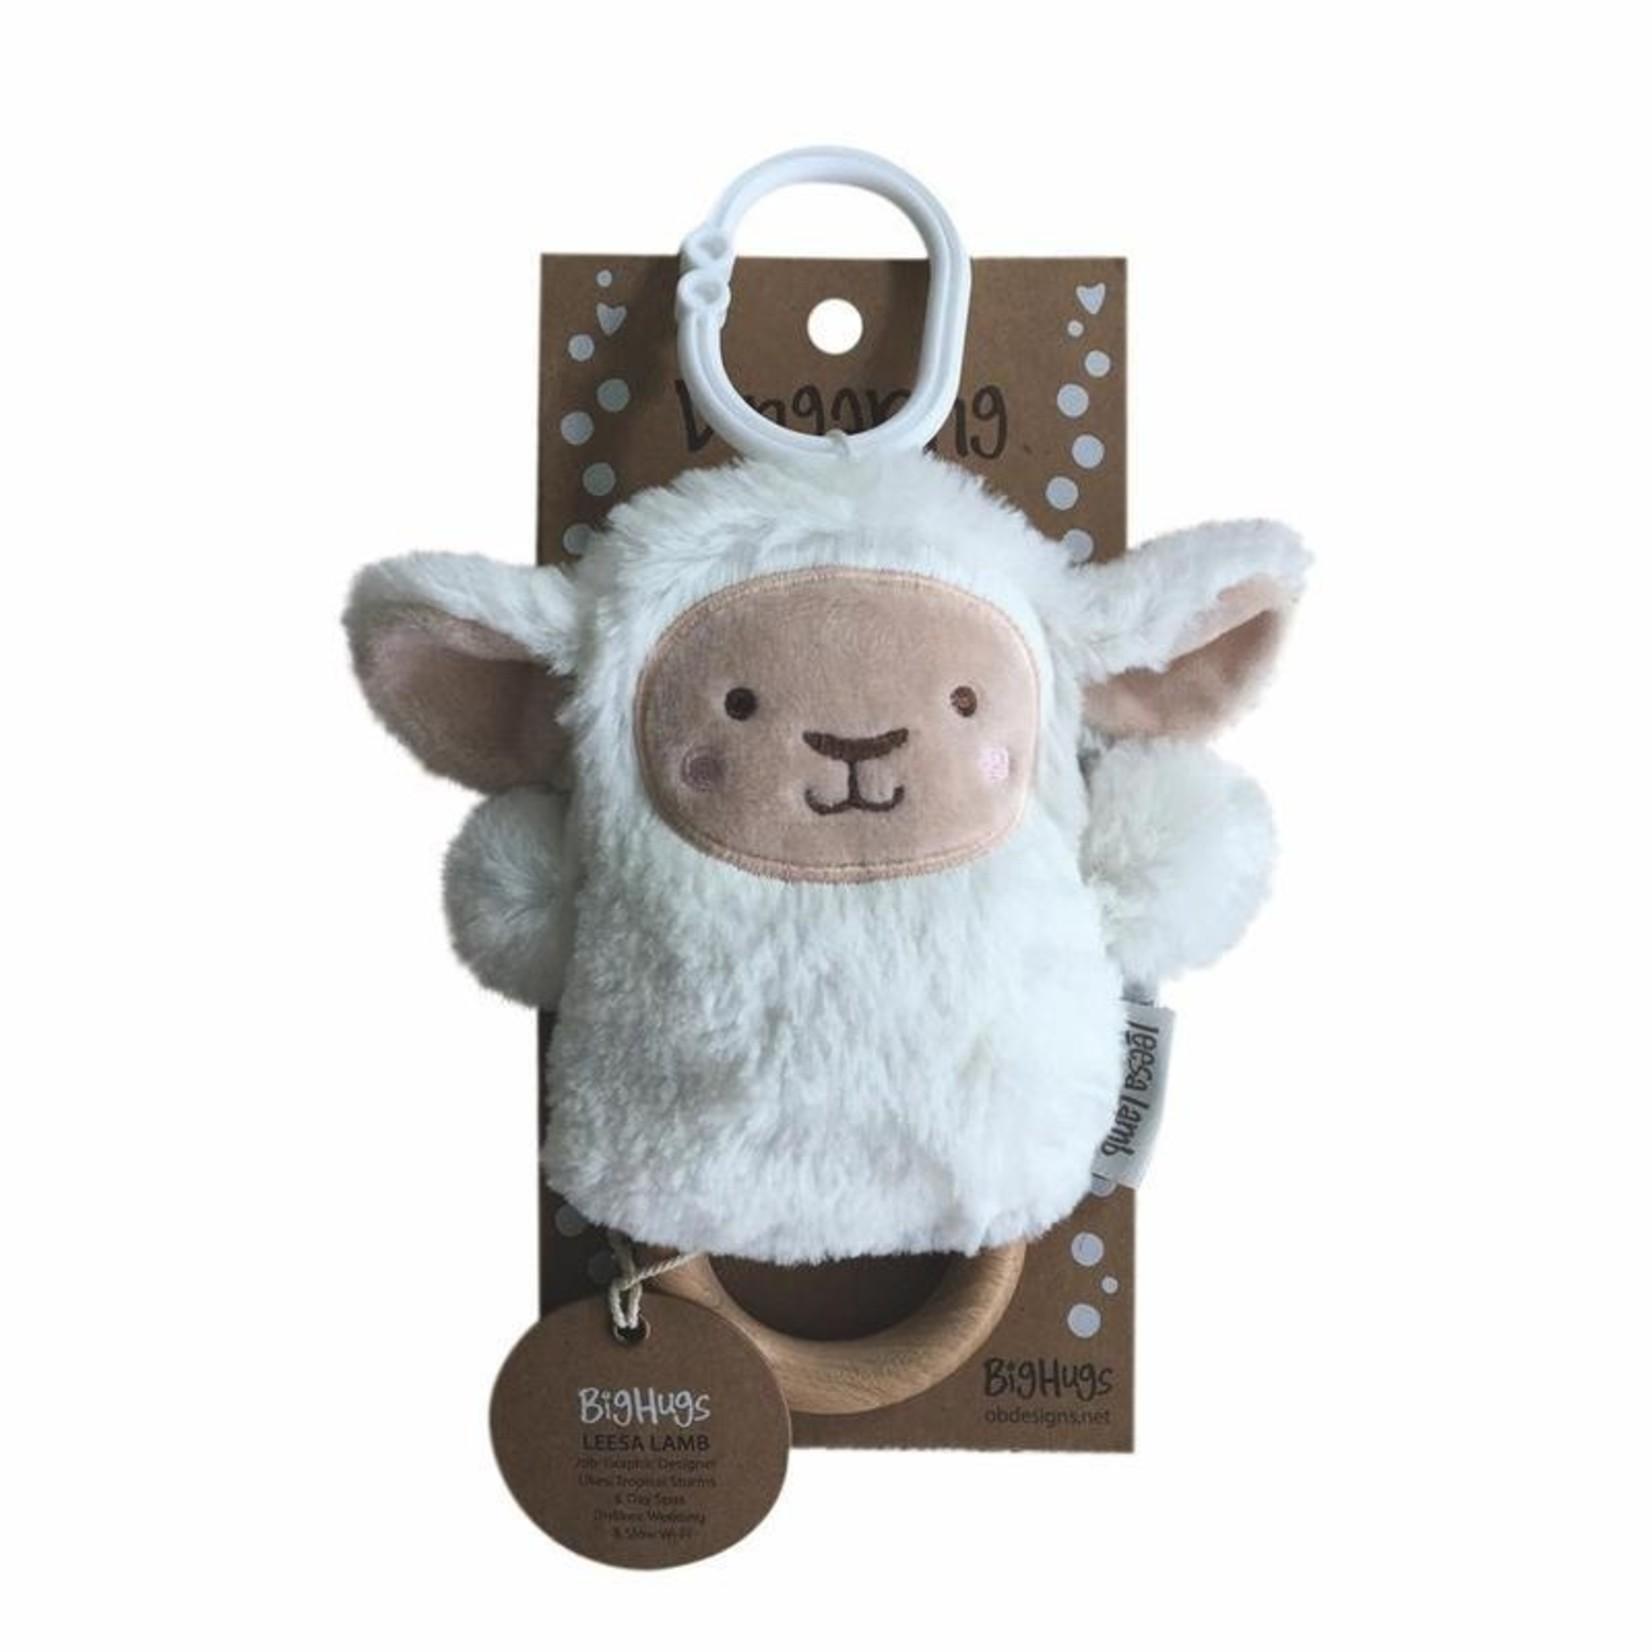 Lee Lamb Wooden Baby Teether